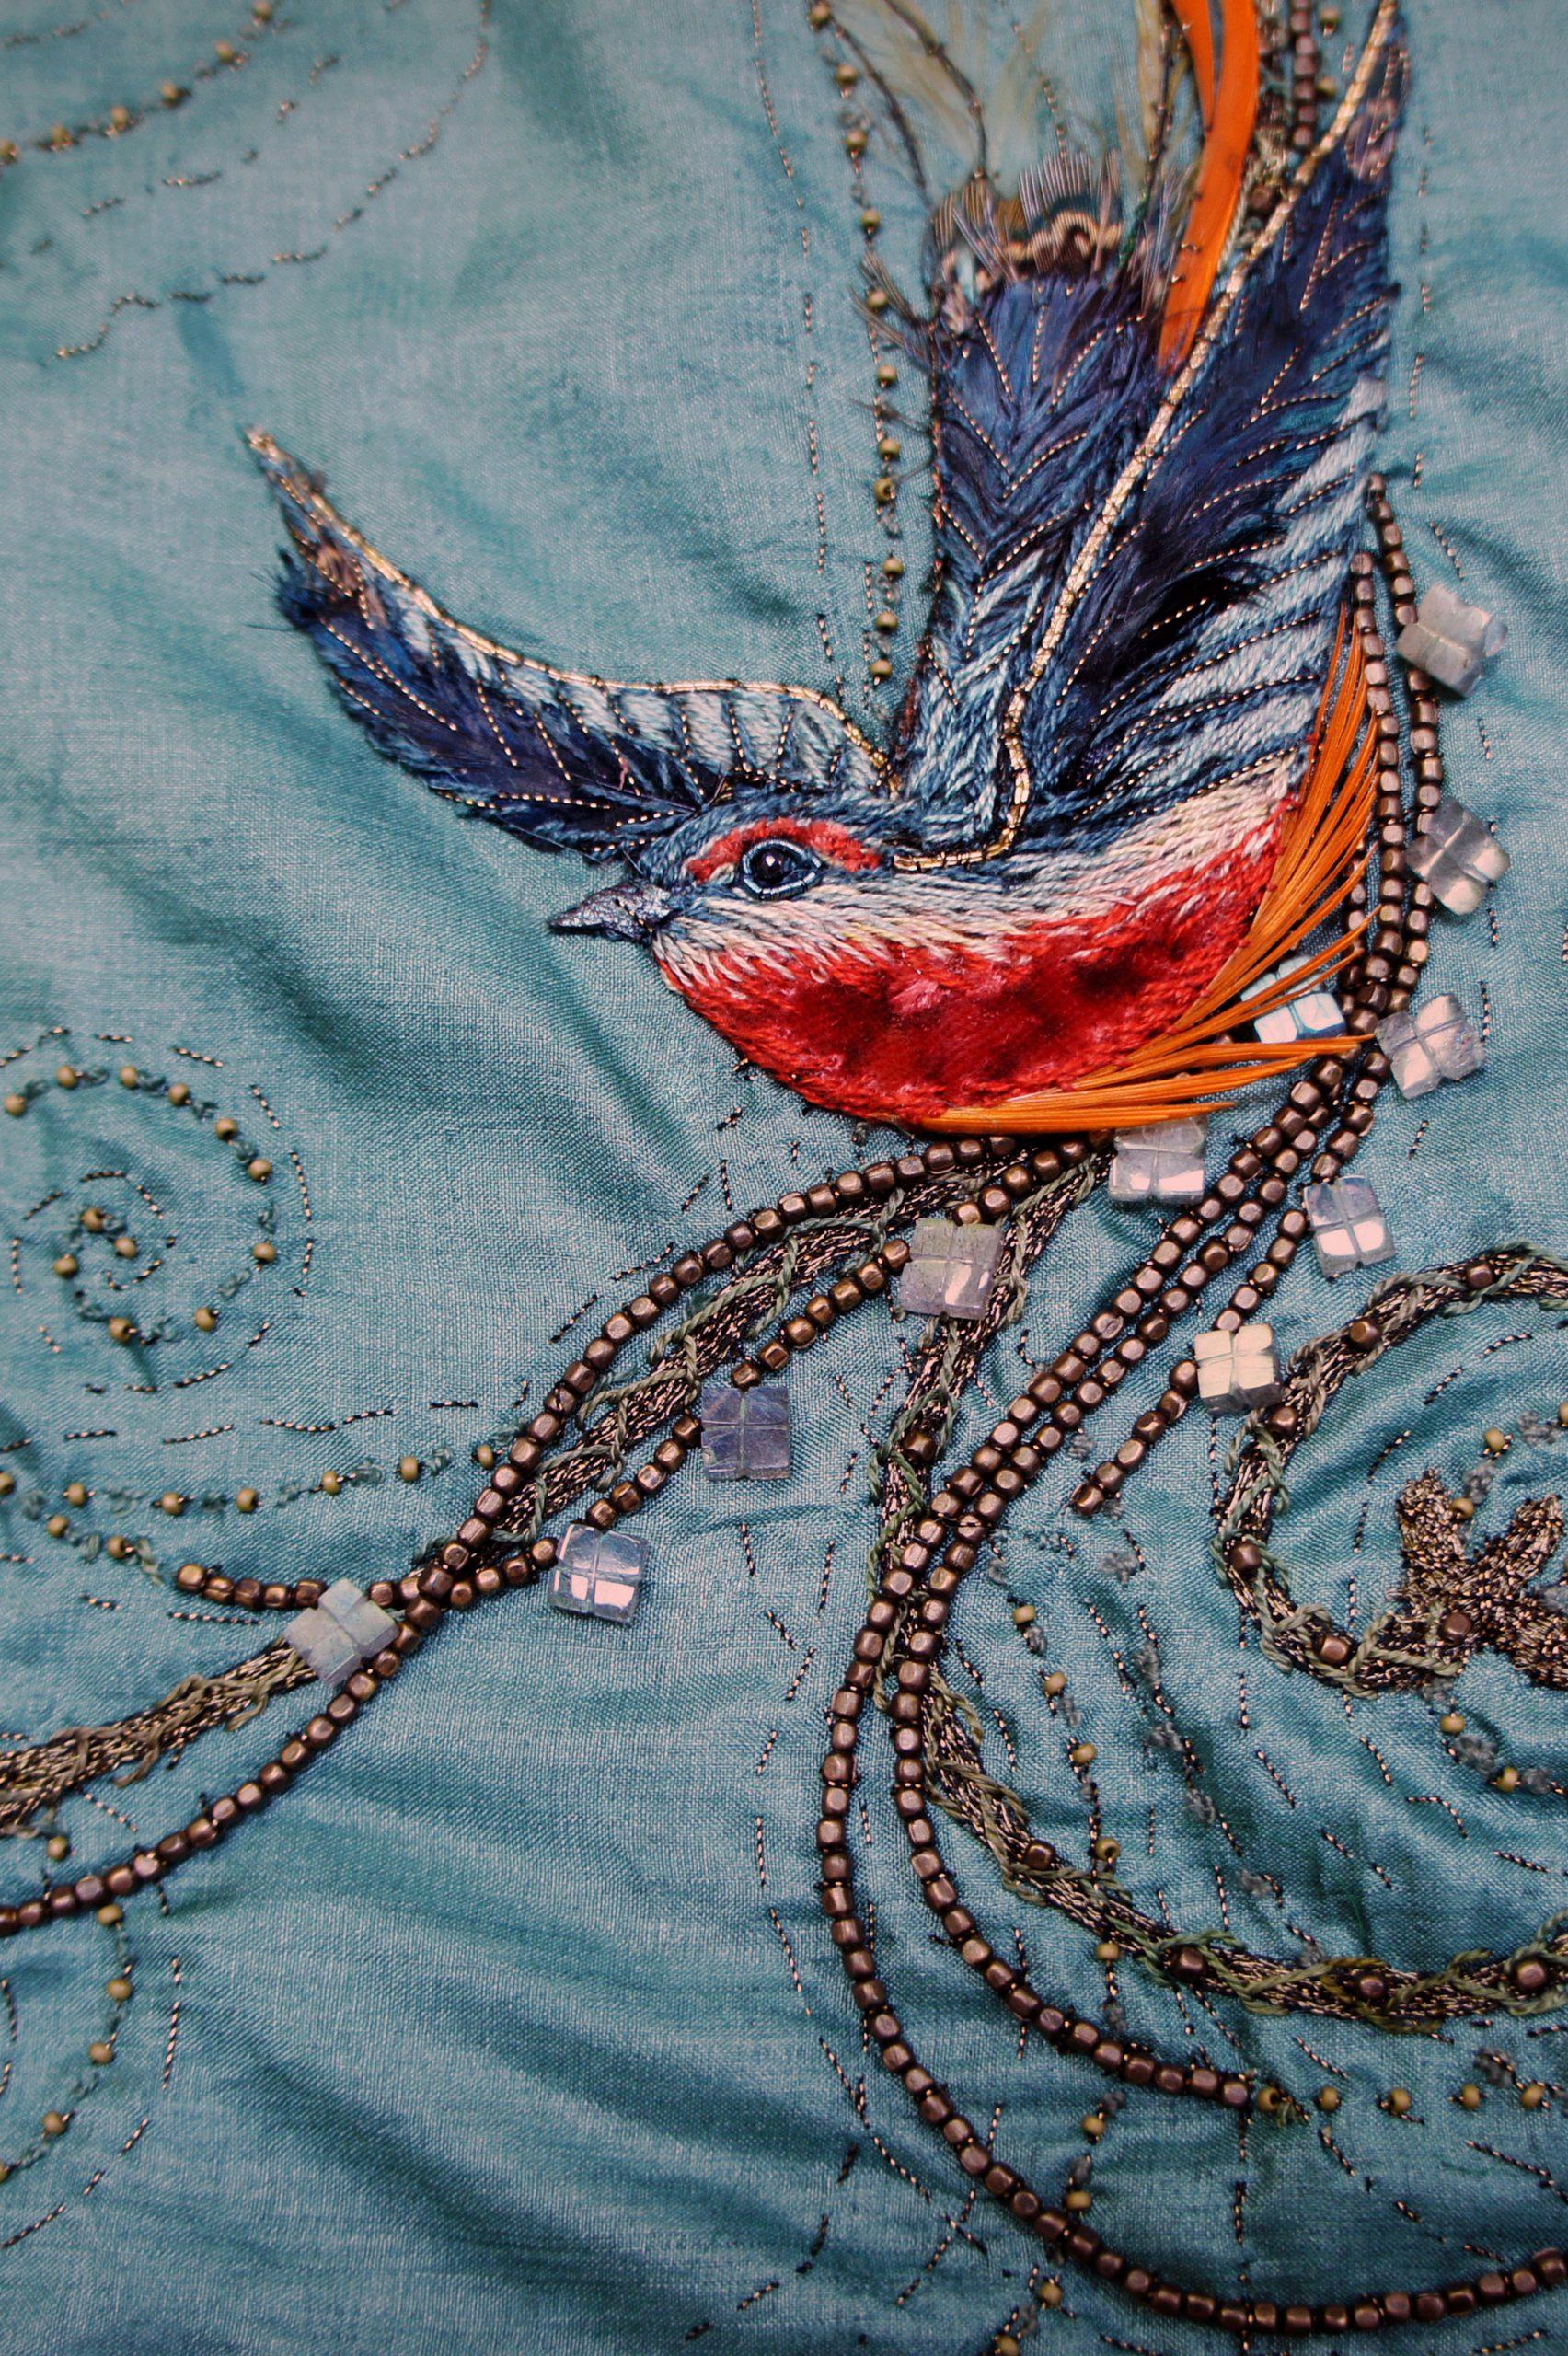 CERSEI-BLUE-BIRD-EMBROIDERY-CLOSE-UP-MICHELE-CARRAGHER-